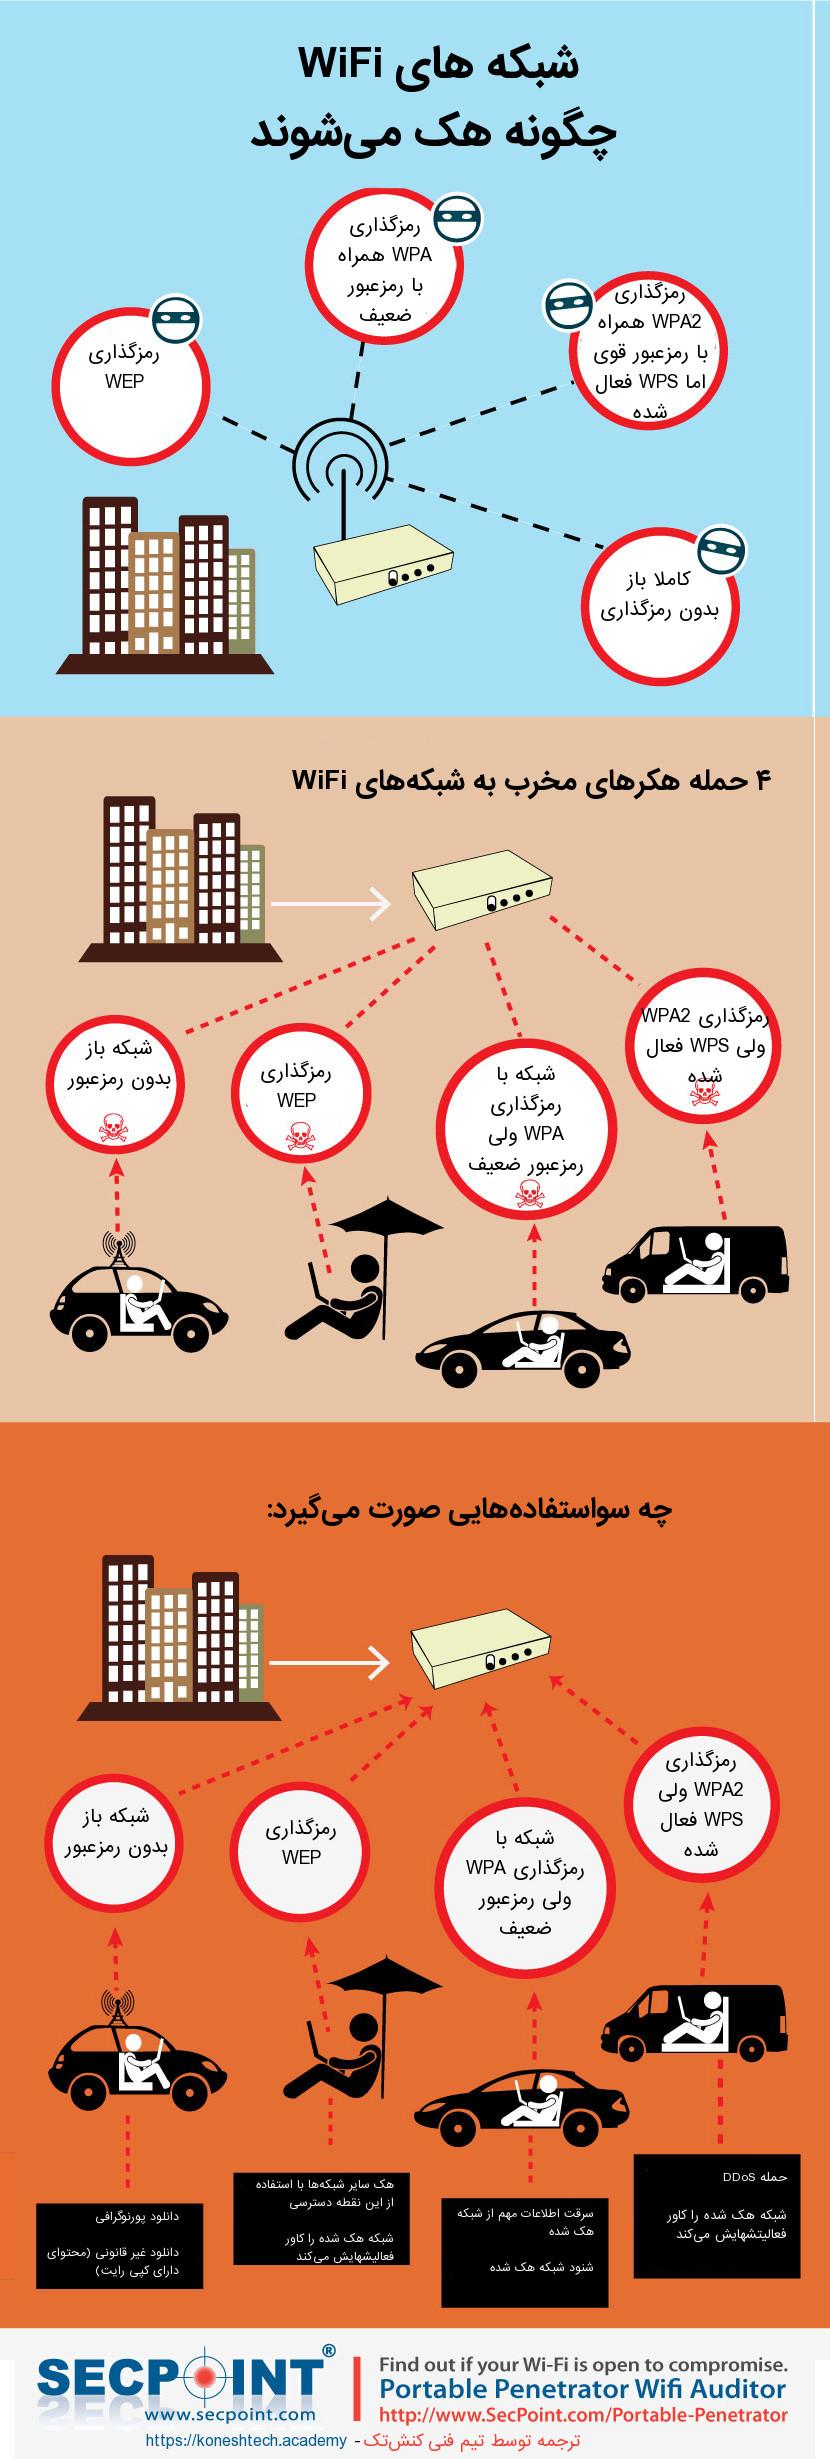 چگونه شبکه WiFi هک میشود